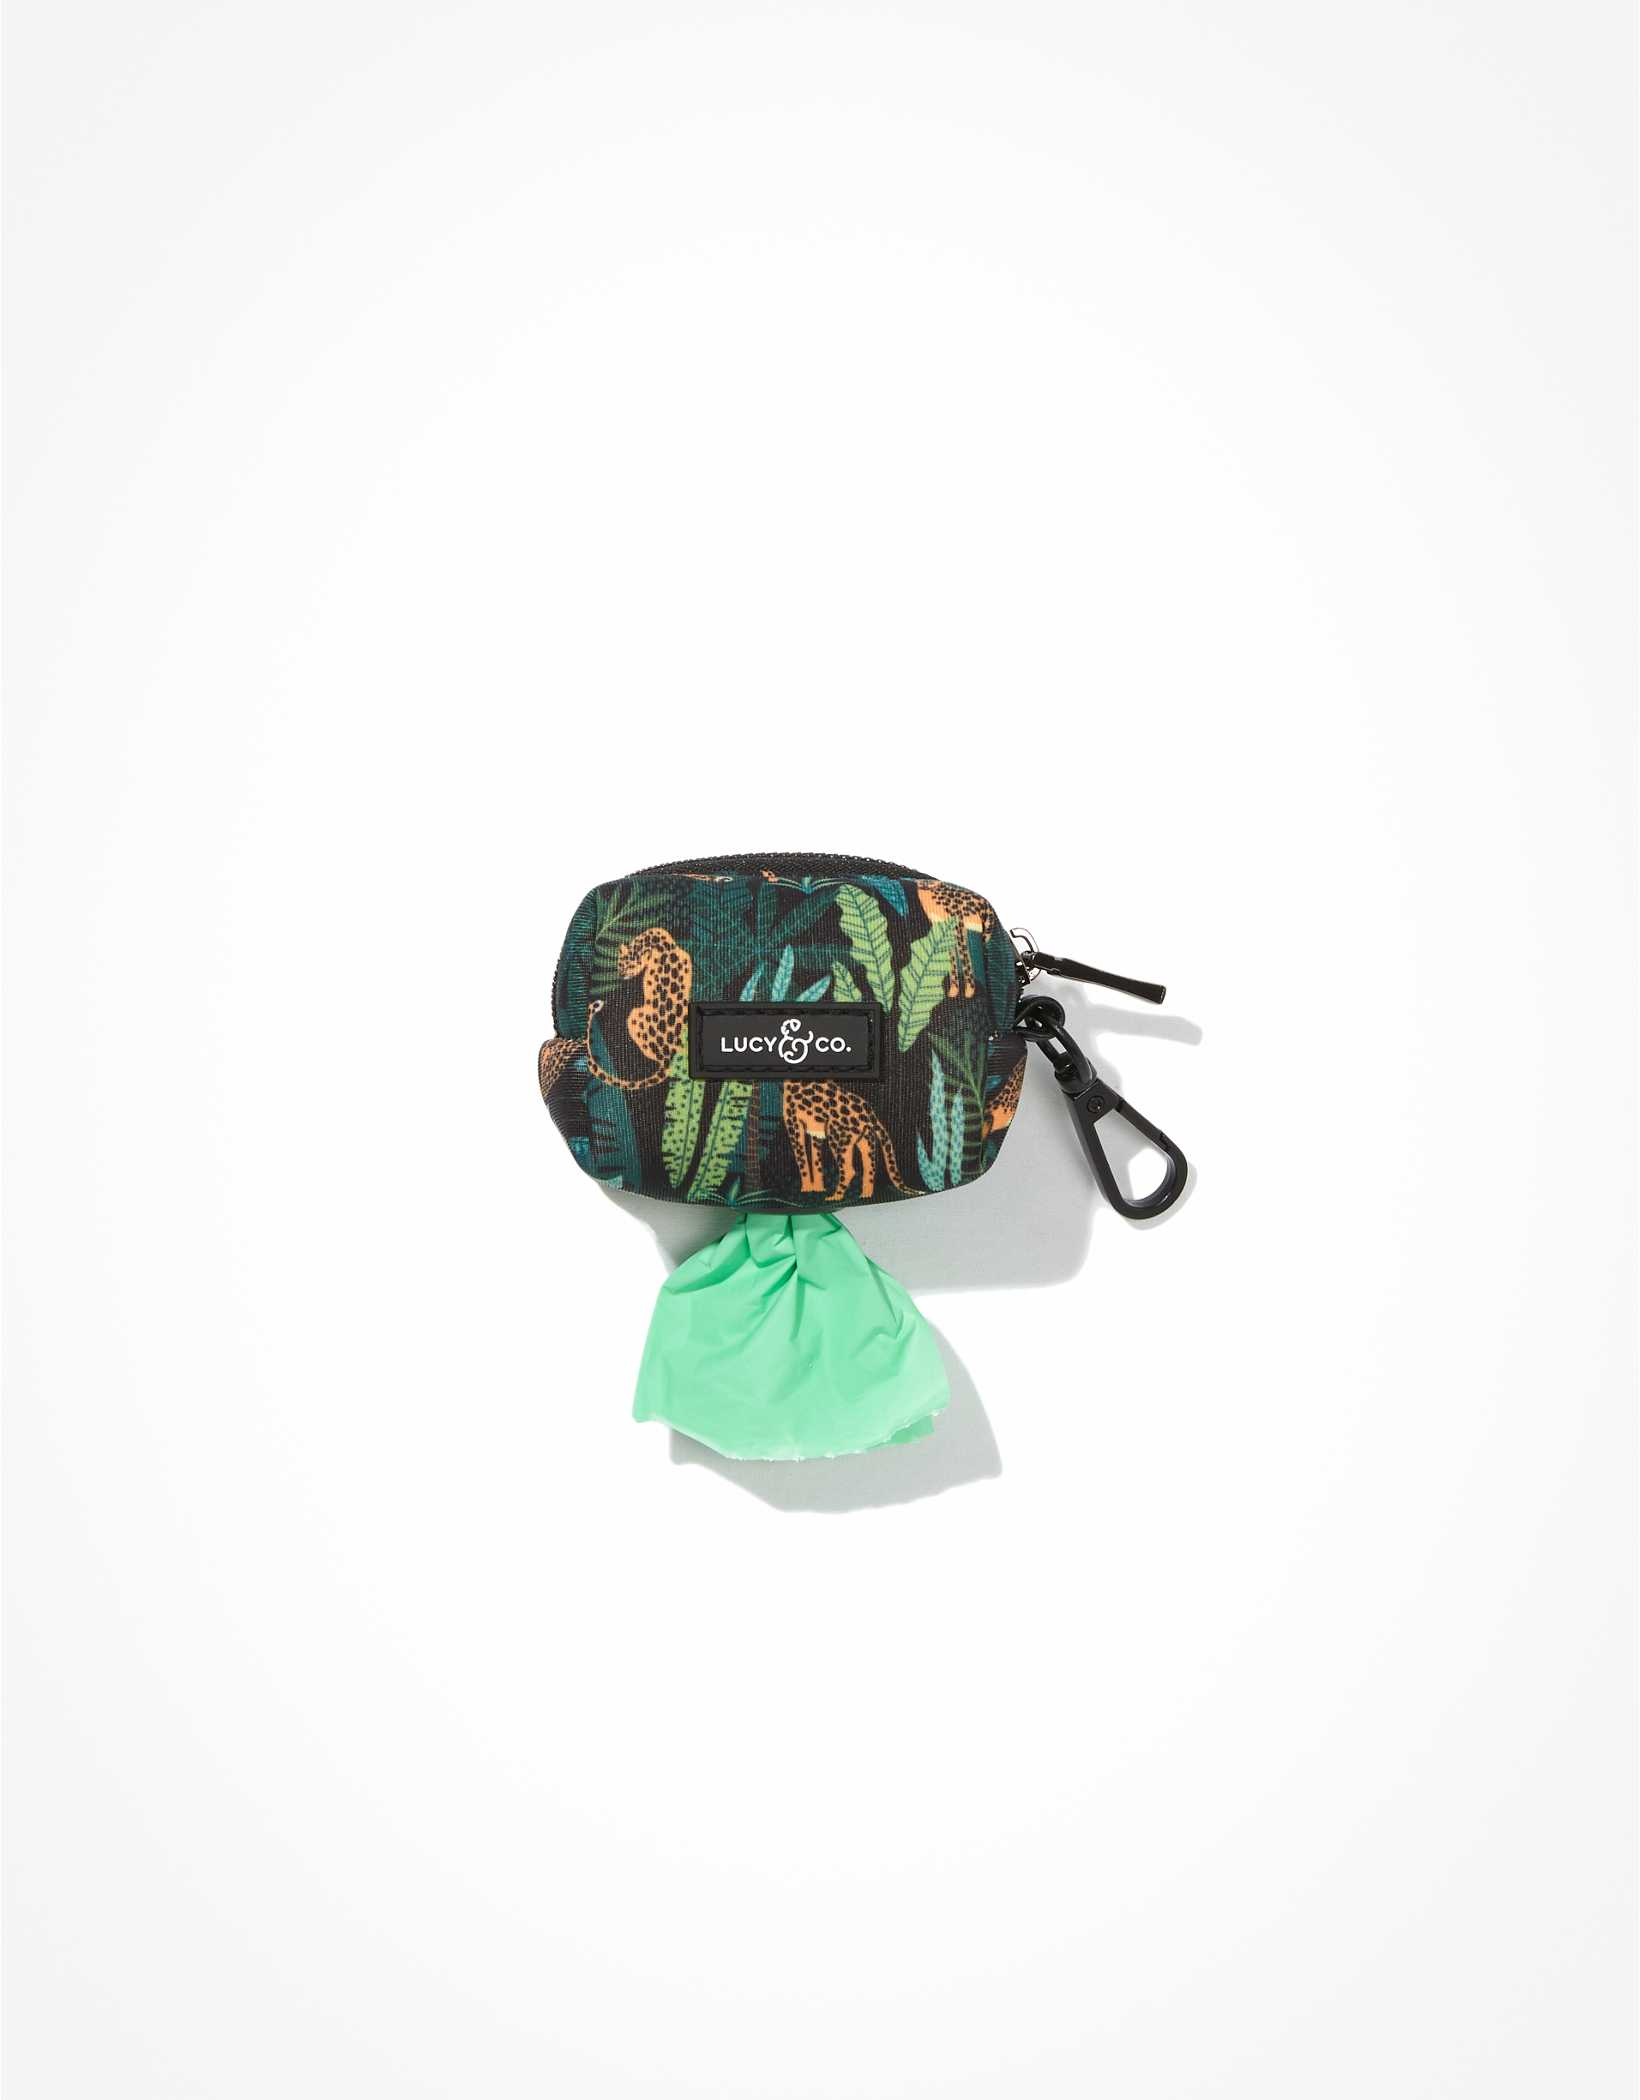 Lucy & Co. Jungle Vibes Poop Bag Holder